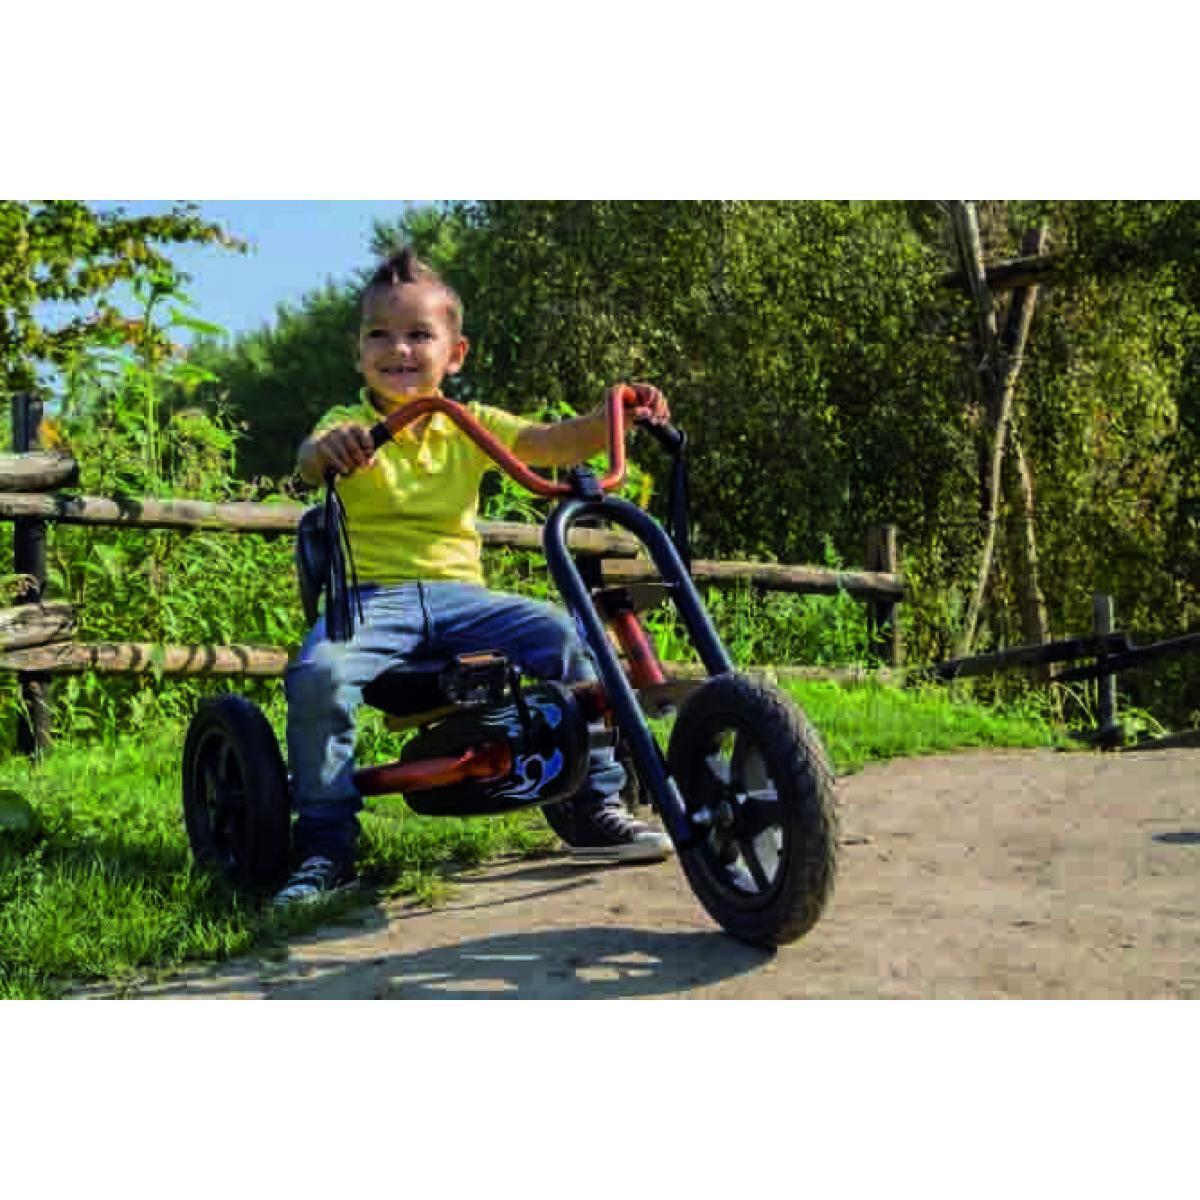 Веломобиль Buzzy Choopy 3-8 лет (Berg, Нидерланды) - фото 4